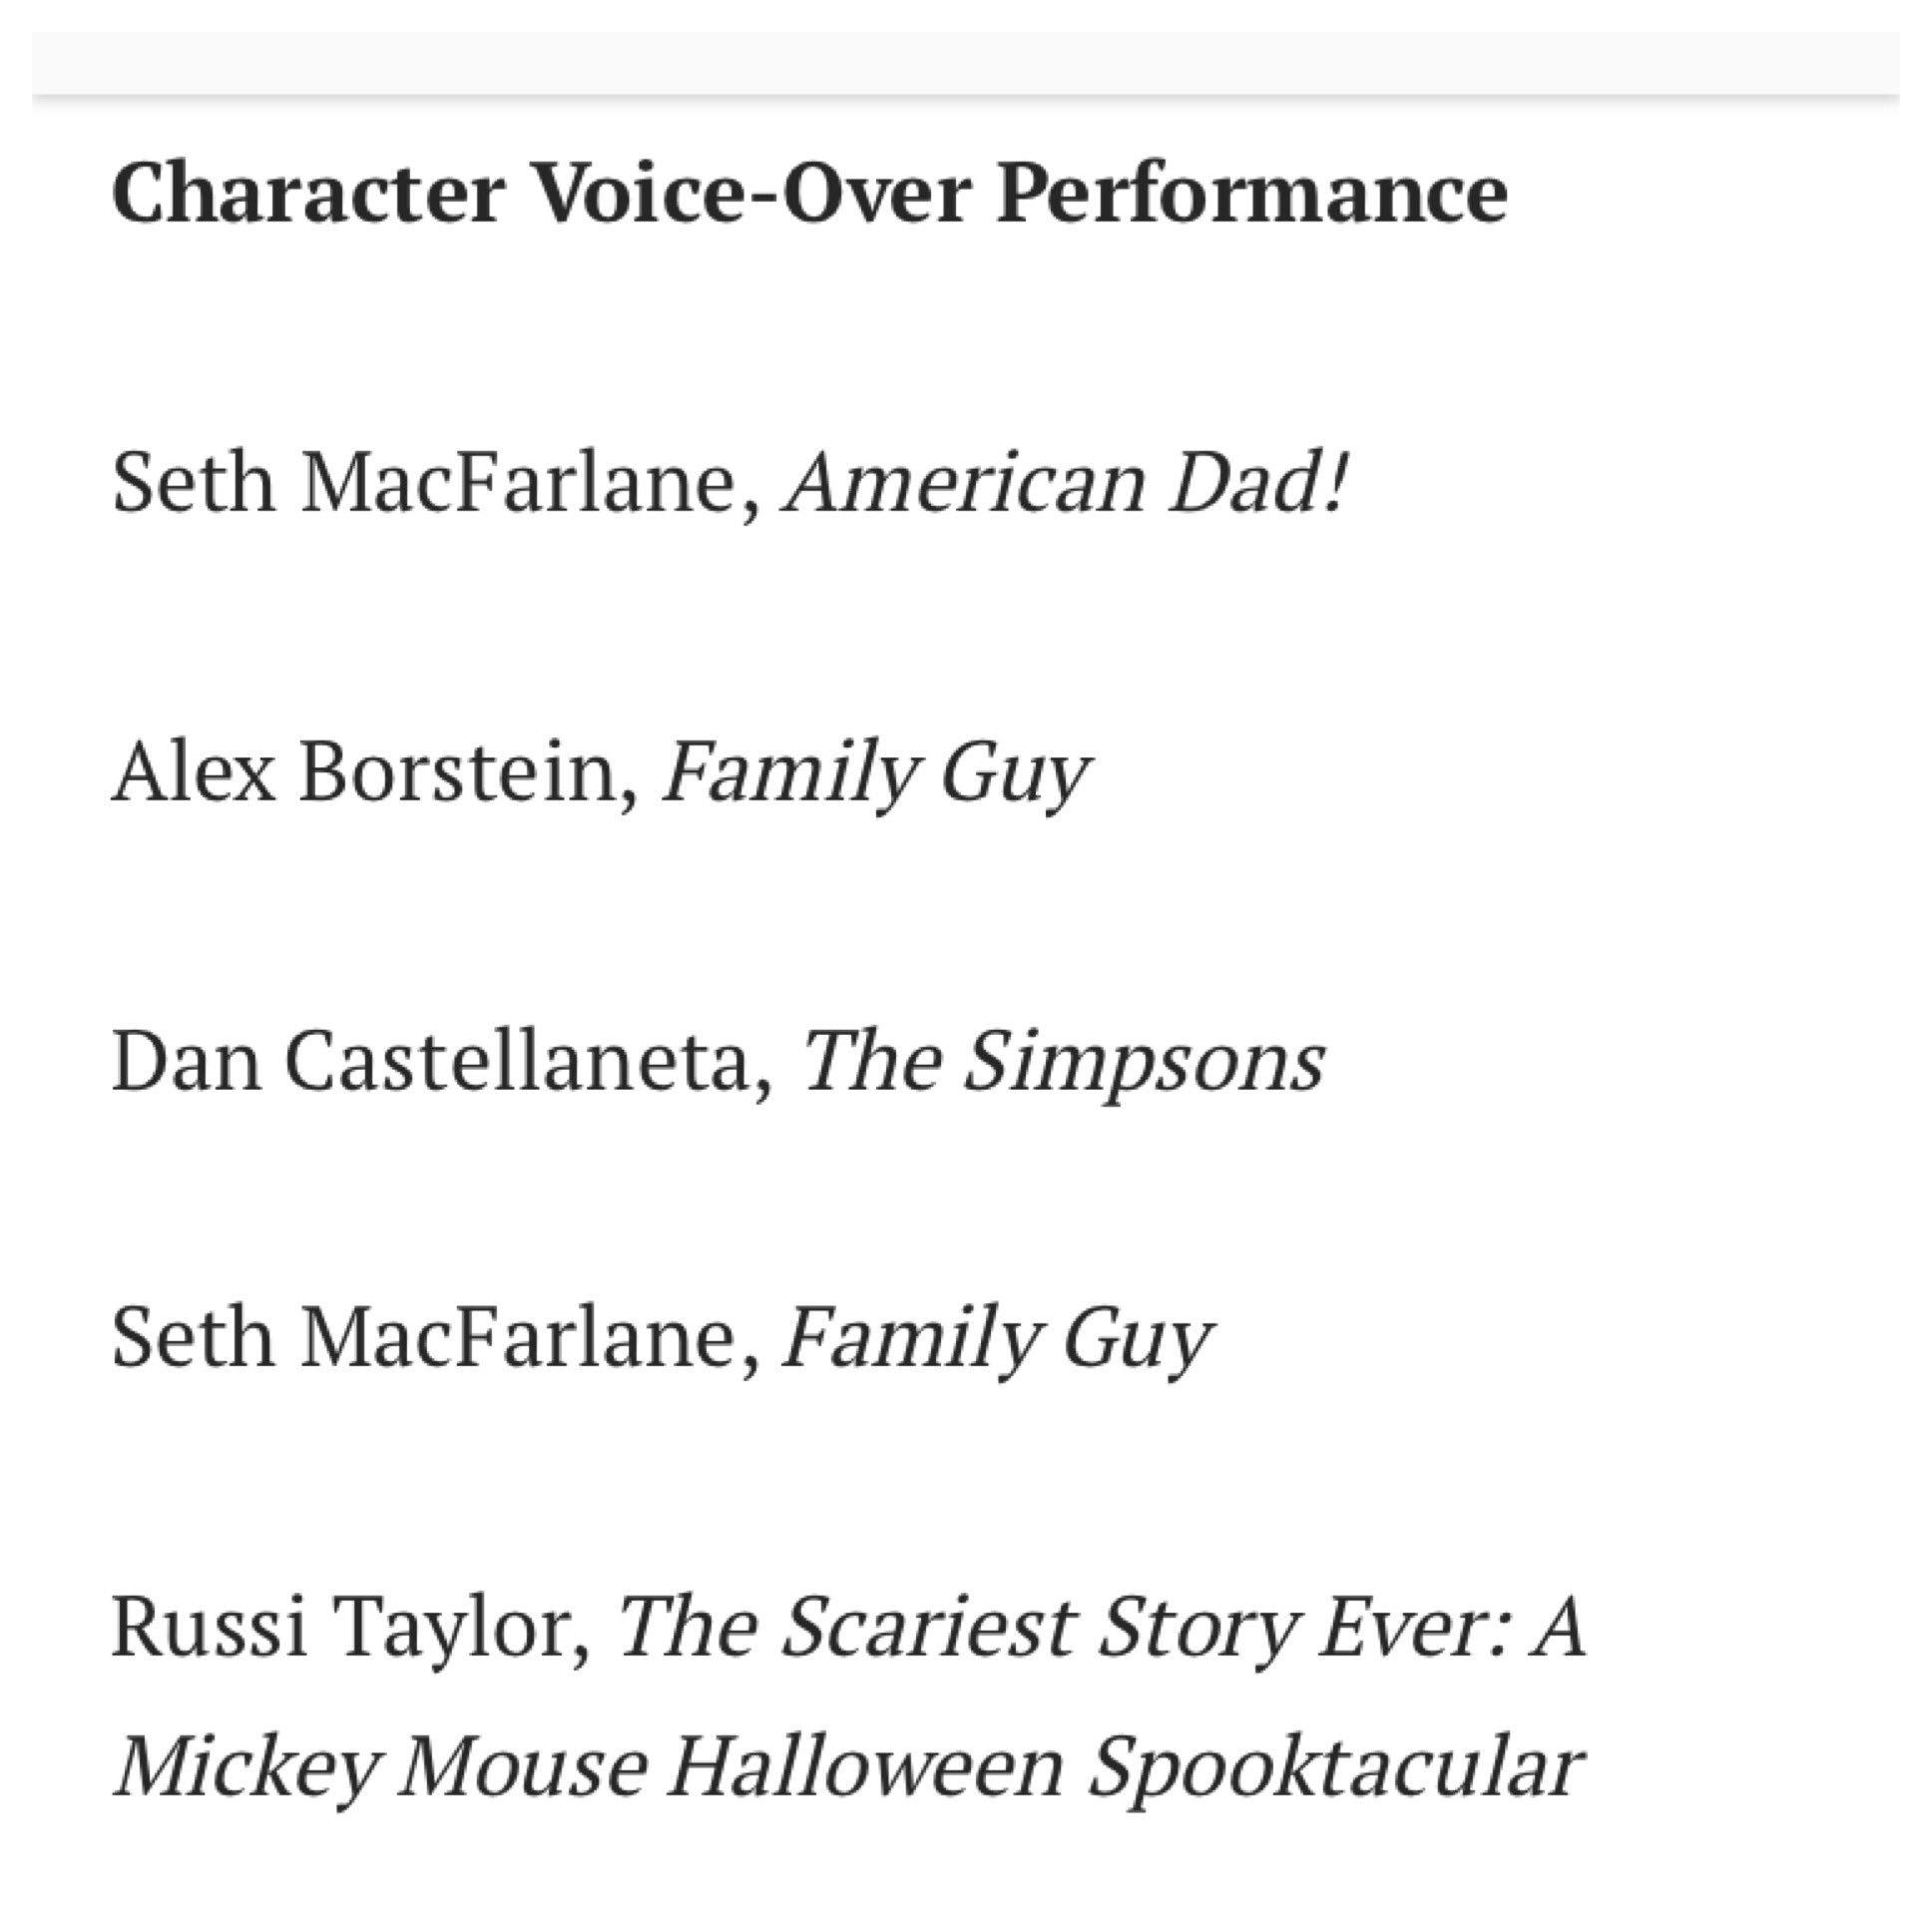 Congrats to both Seth MacFarlanes https://t.co/IBbO0BhRrO